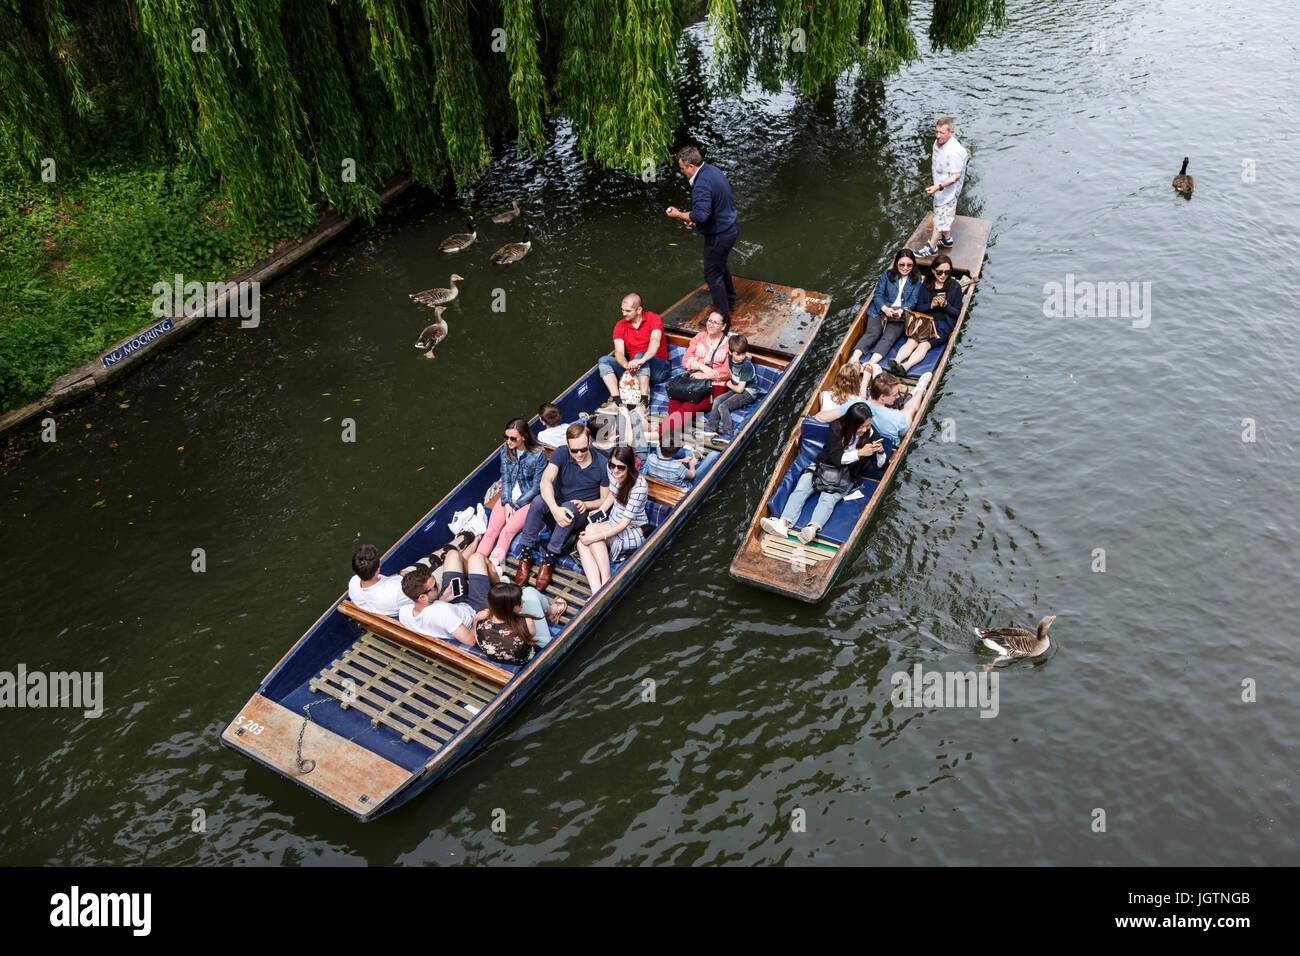 People punting on the River Cam, Cambridge, Cambridgeshire, England, United Kingdom Stock Photo